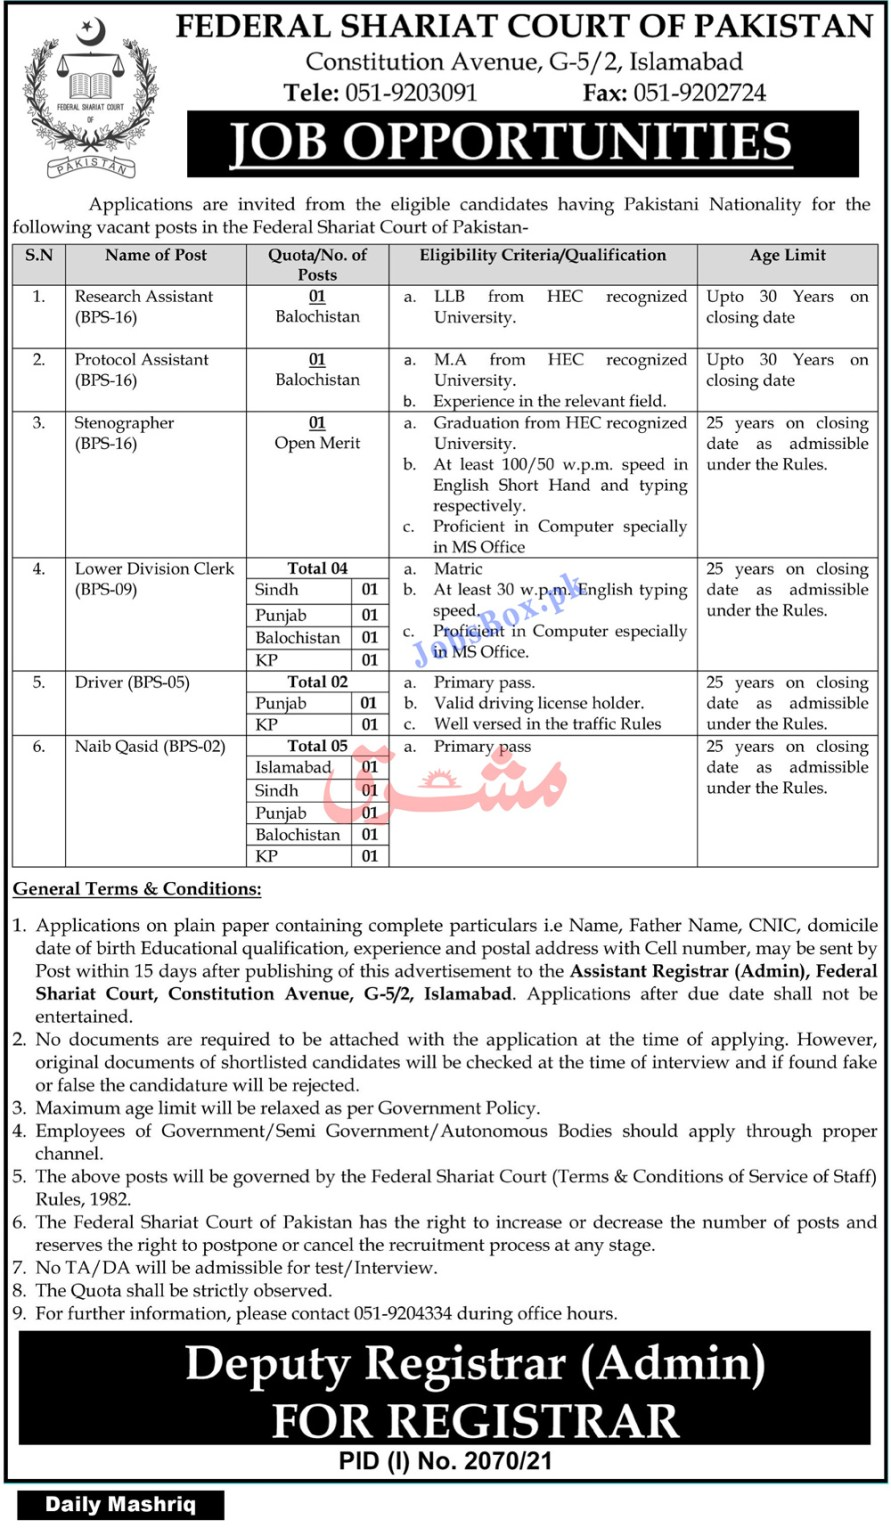 Latest Federal Shariat Court of Pakistan Jobs Opportunities 2021    Jobs In Pakistan 2021